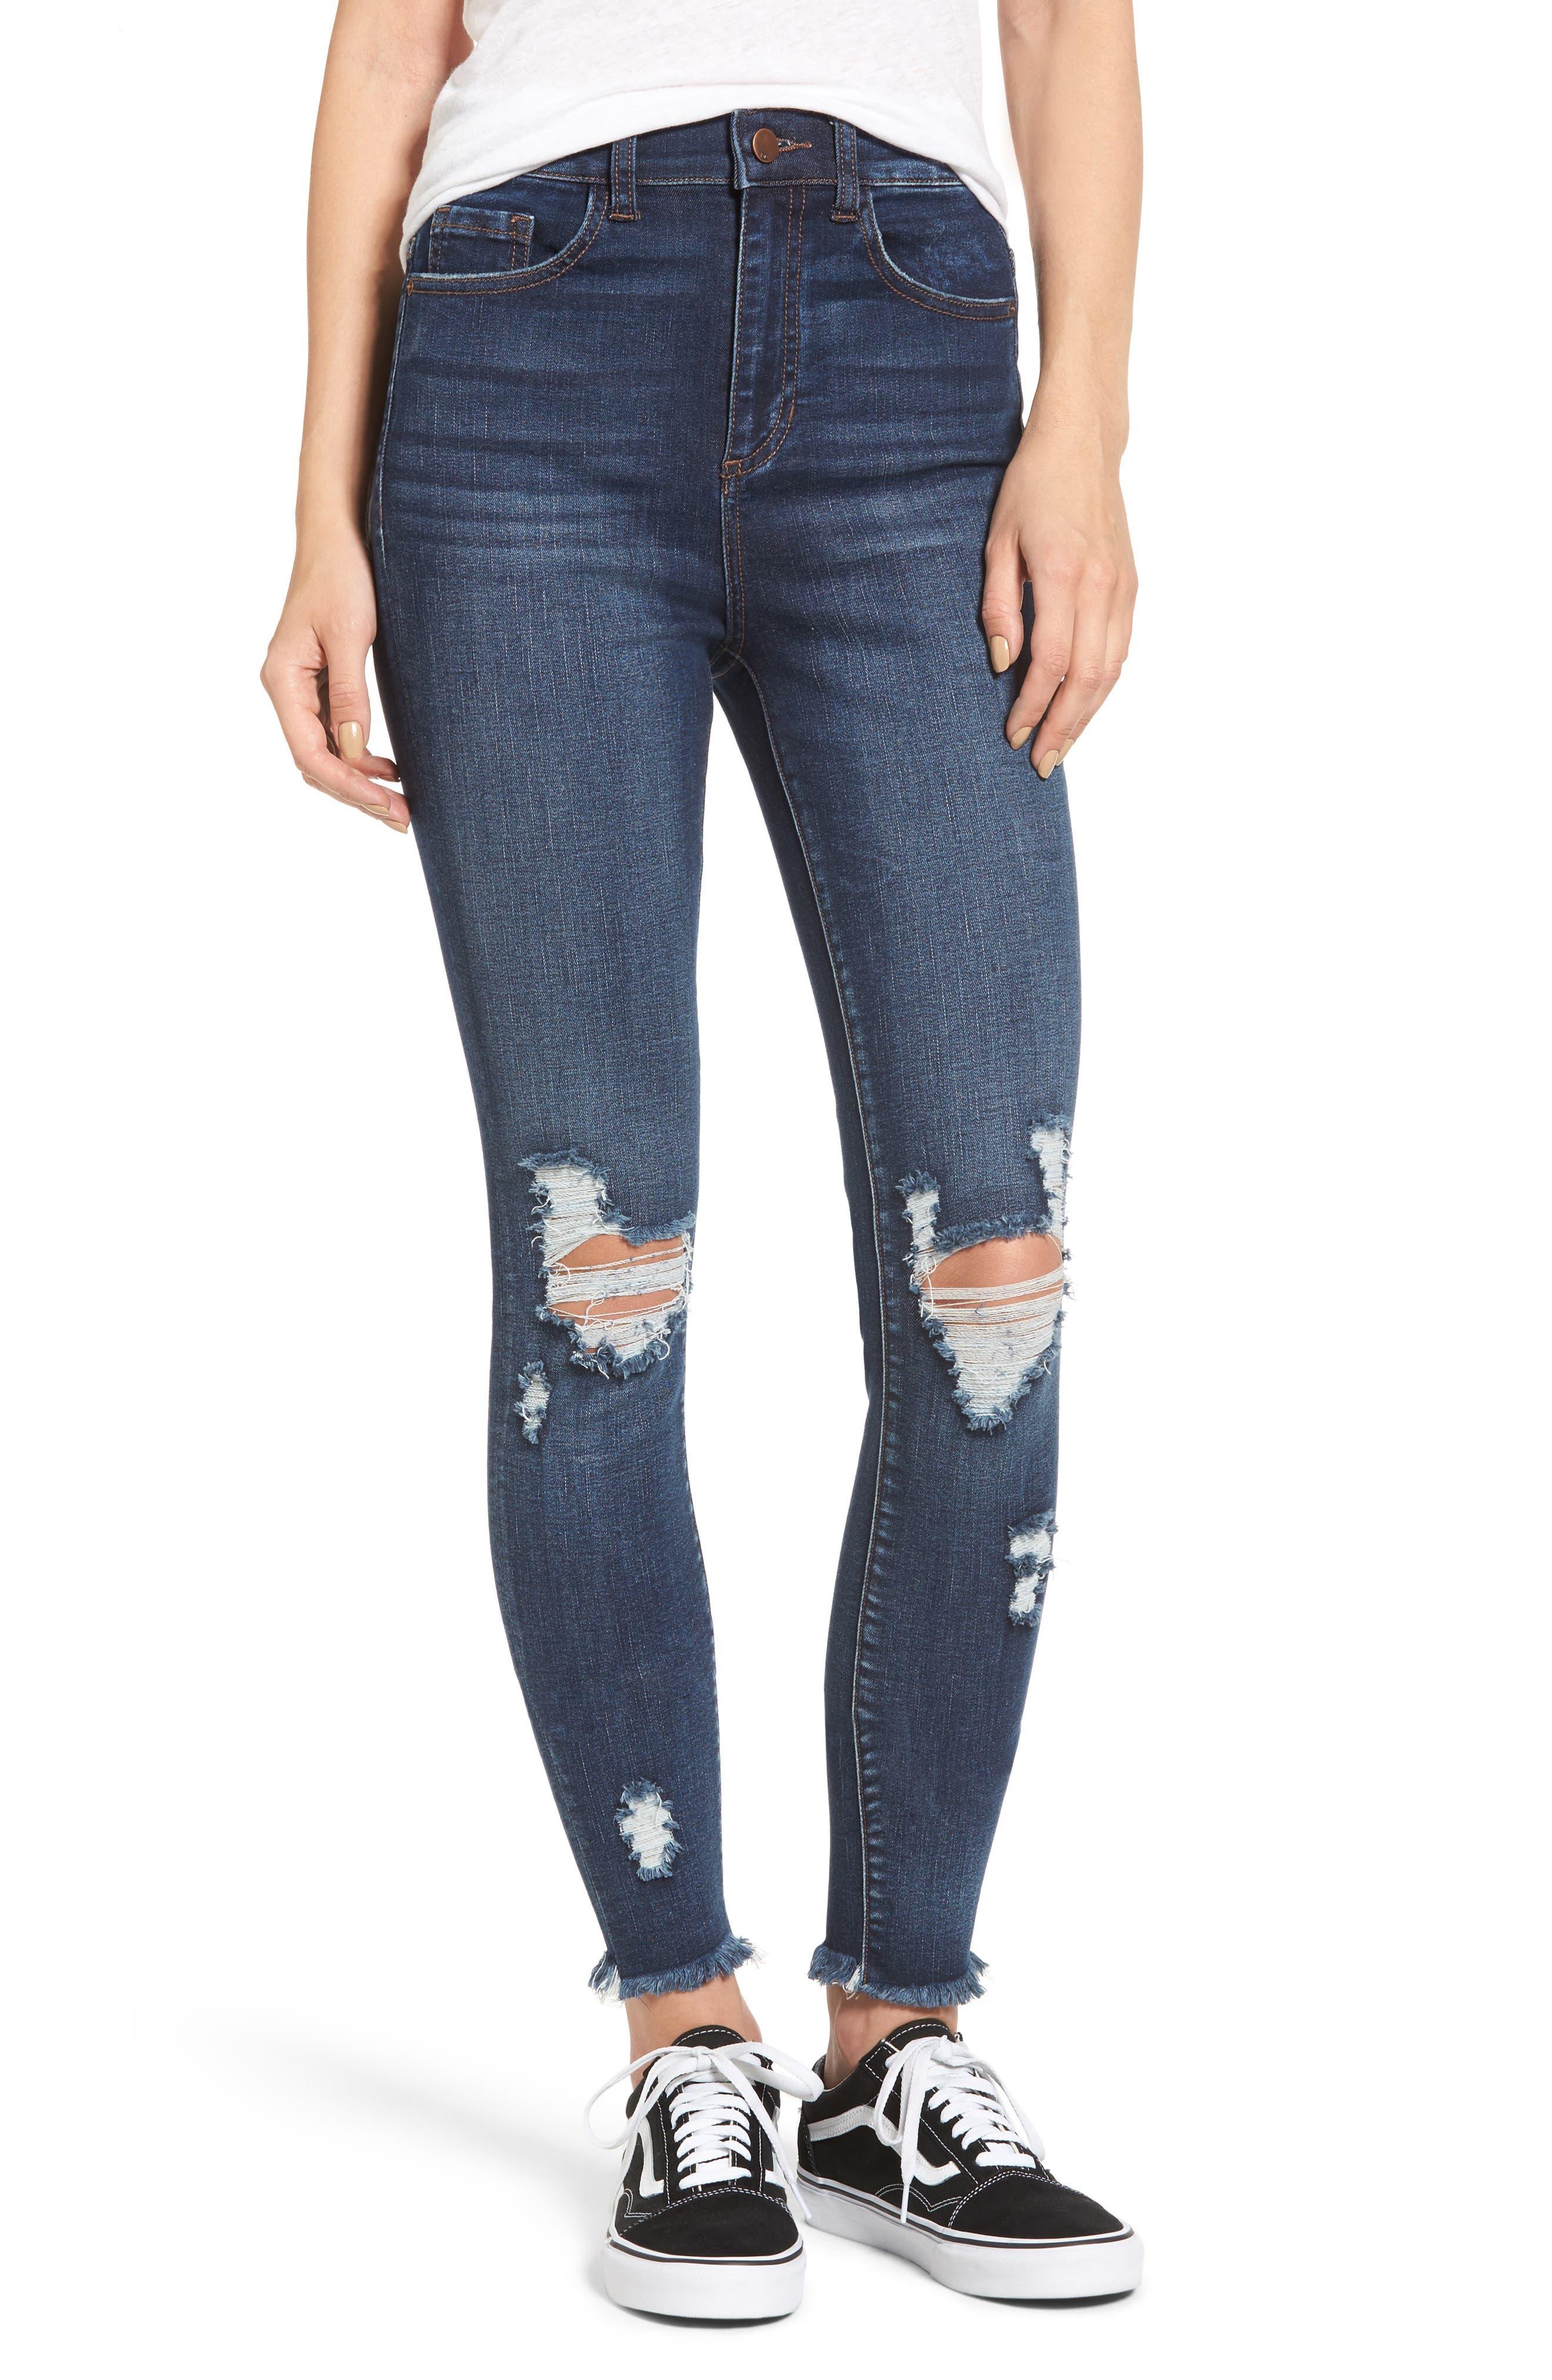 Alternate Image 1 Selected - SP Black Distressed High Waist Skinny Jeans